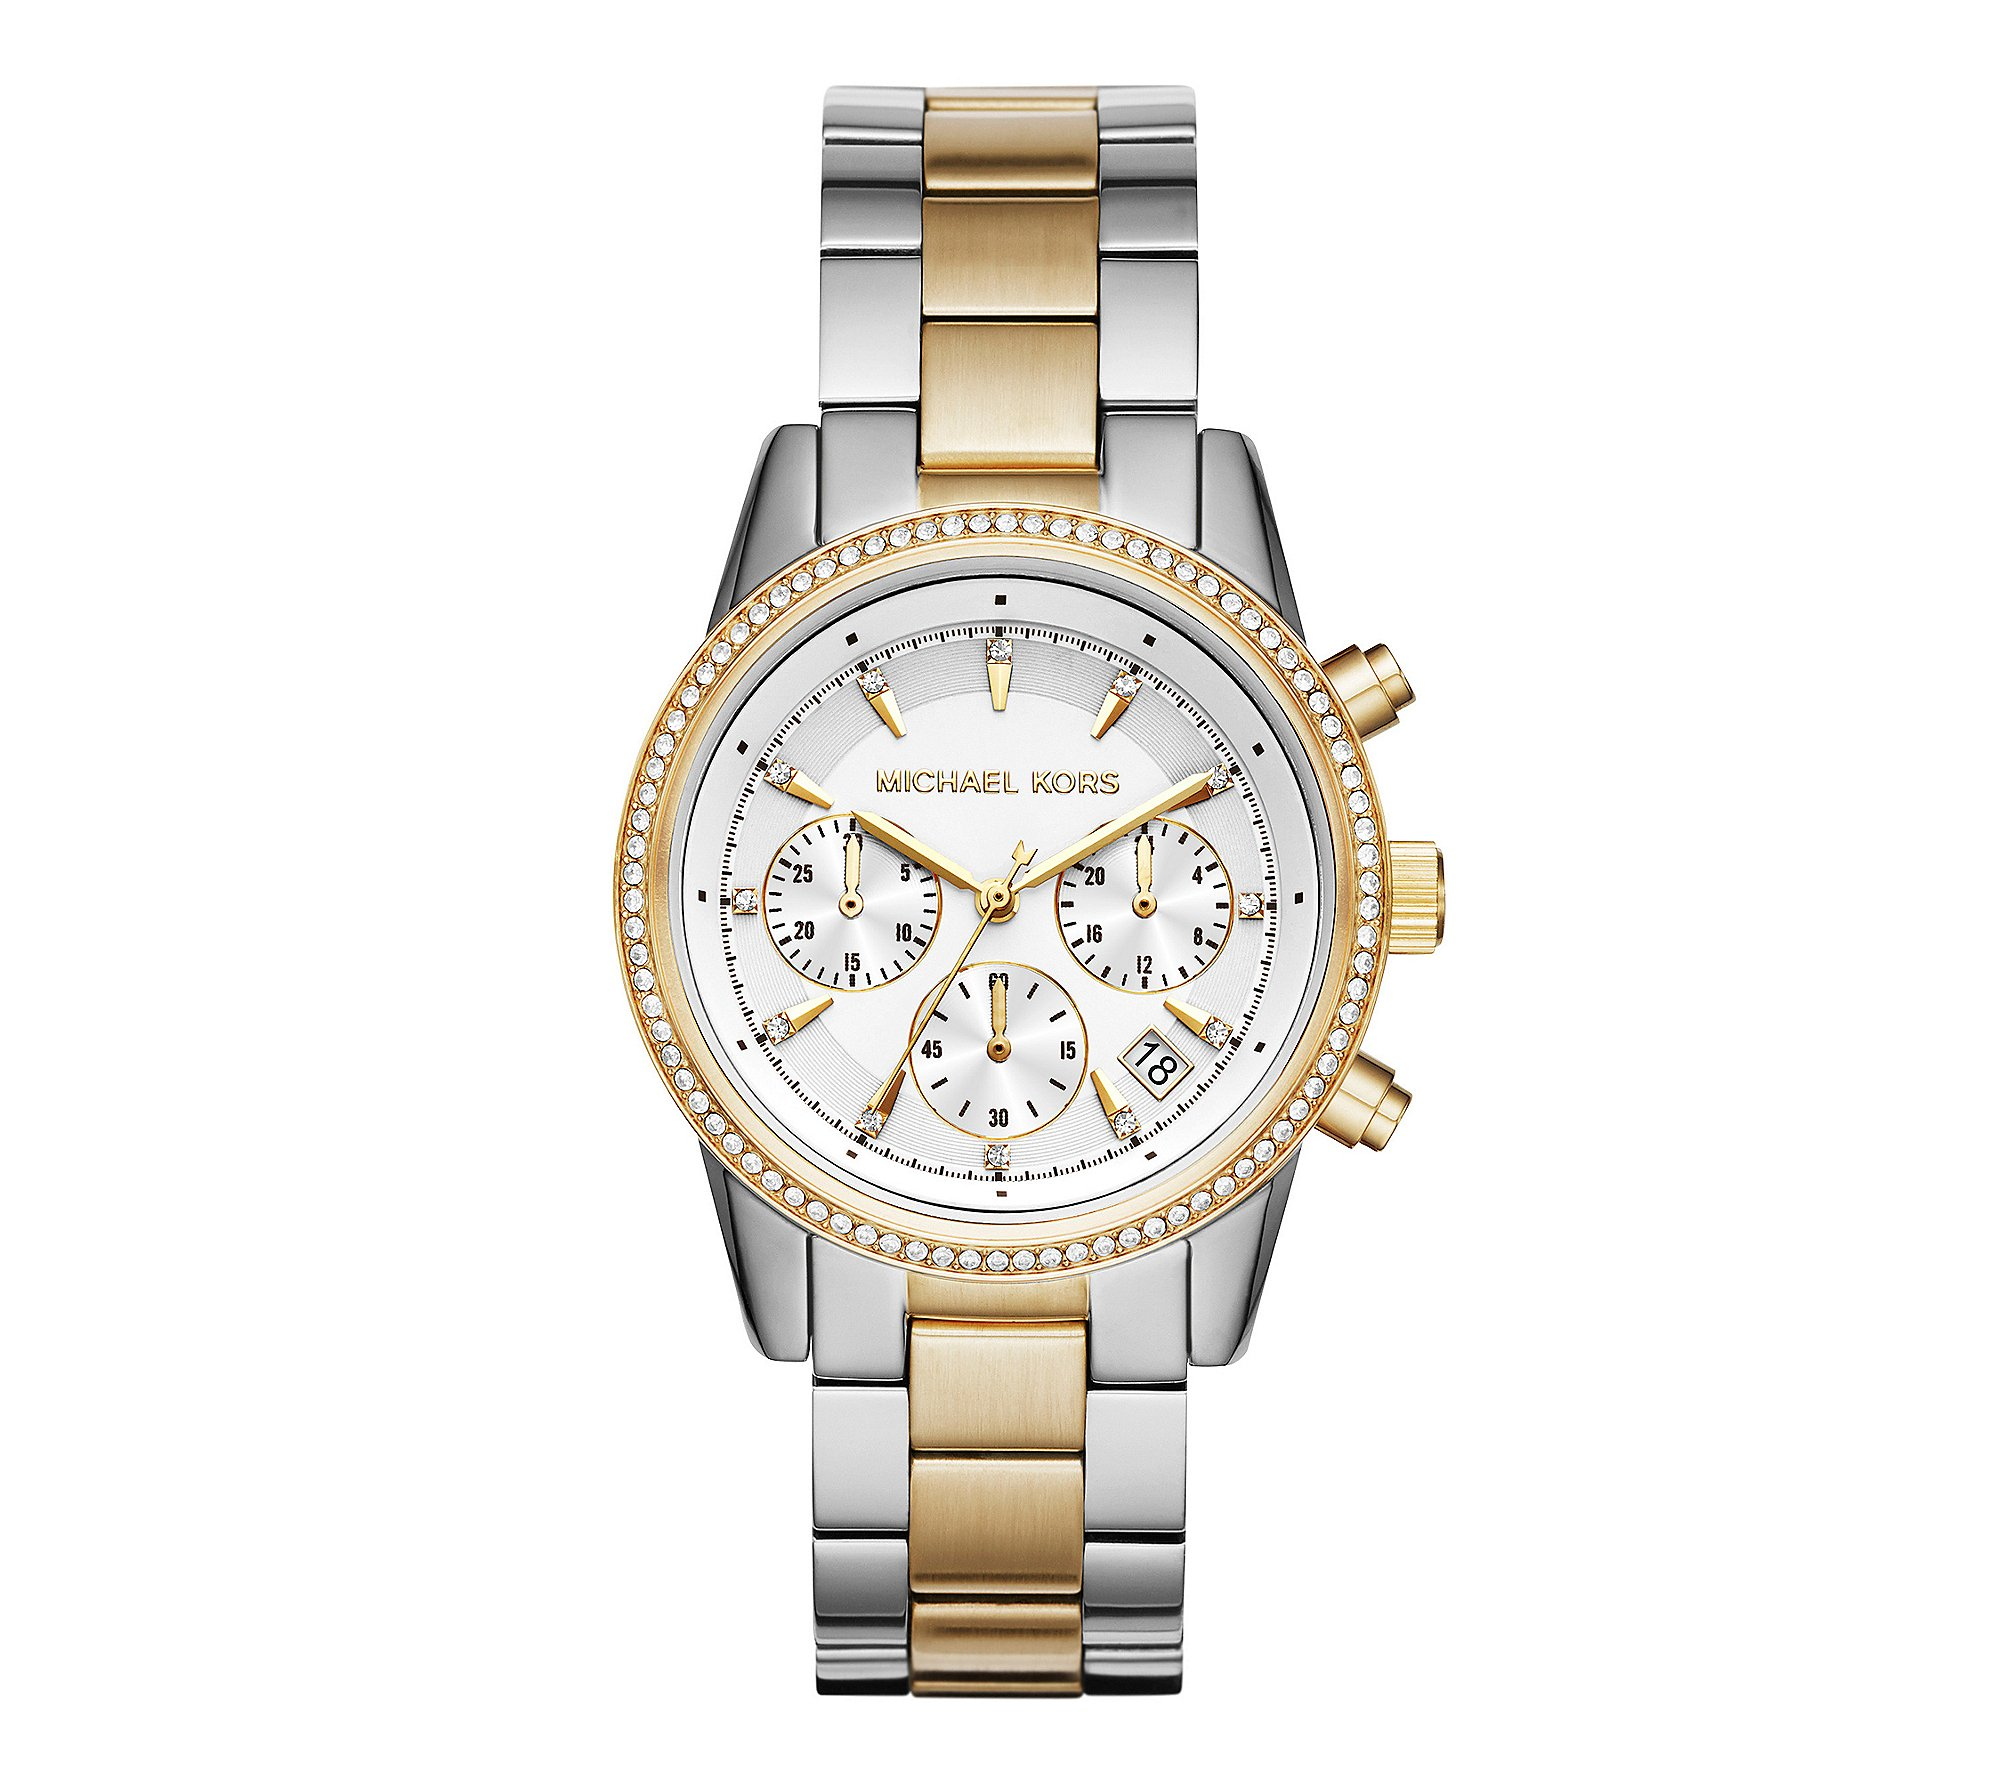 Michael Kors Women's Ritz Silver-Tone Watch MK6474 by Michael Kors